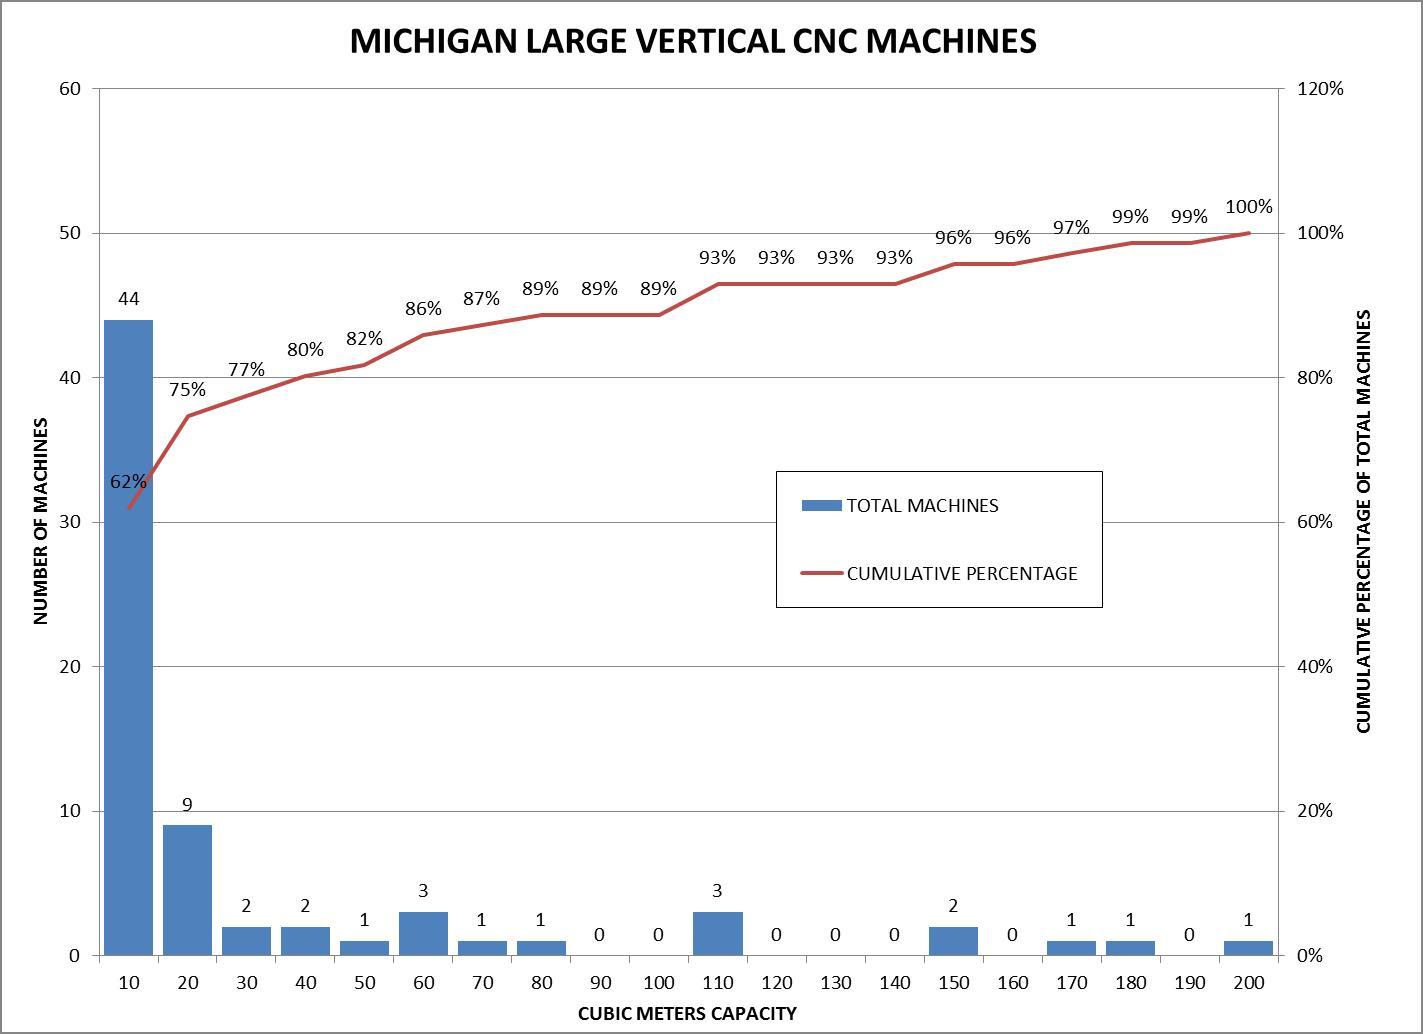 Michigan Large Vertical CNC Machines Histogram